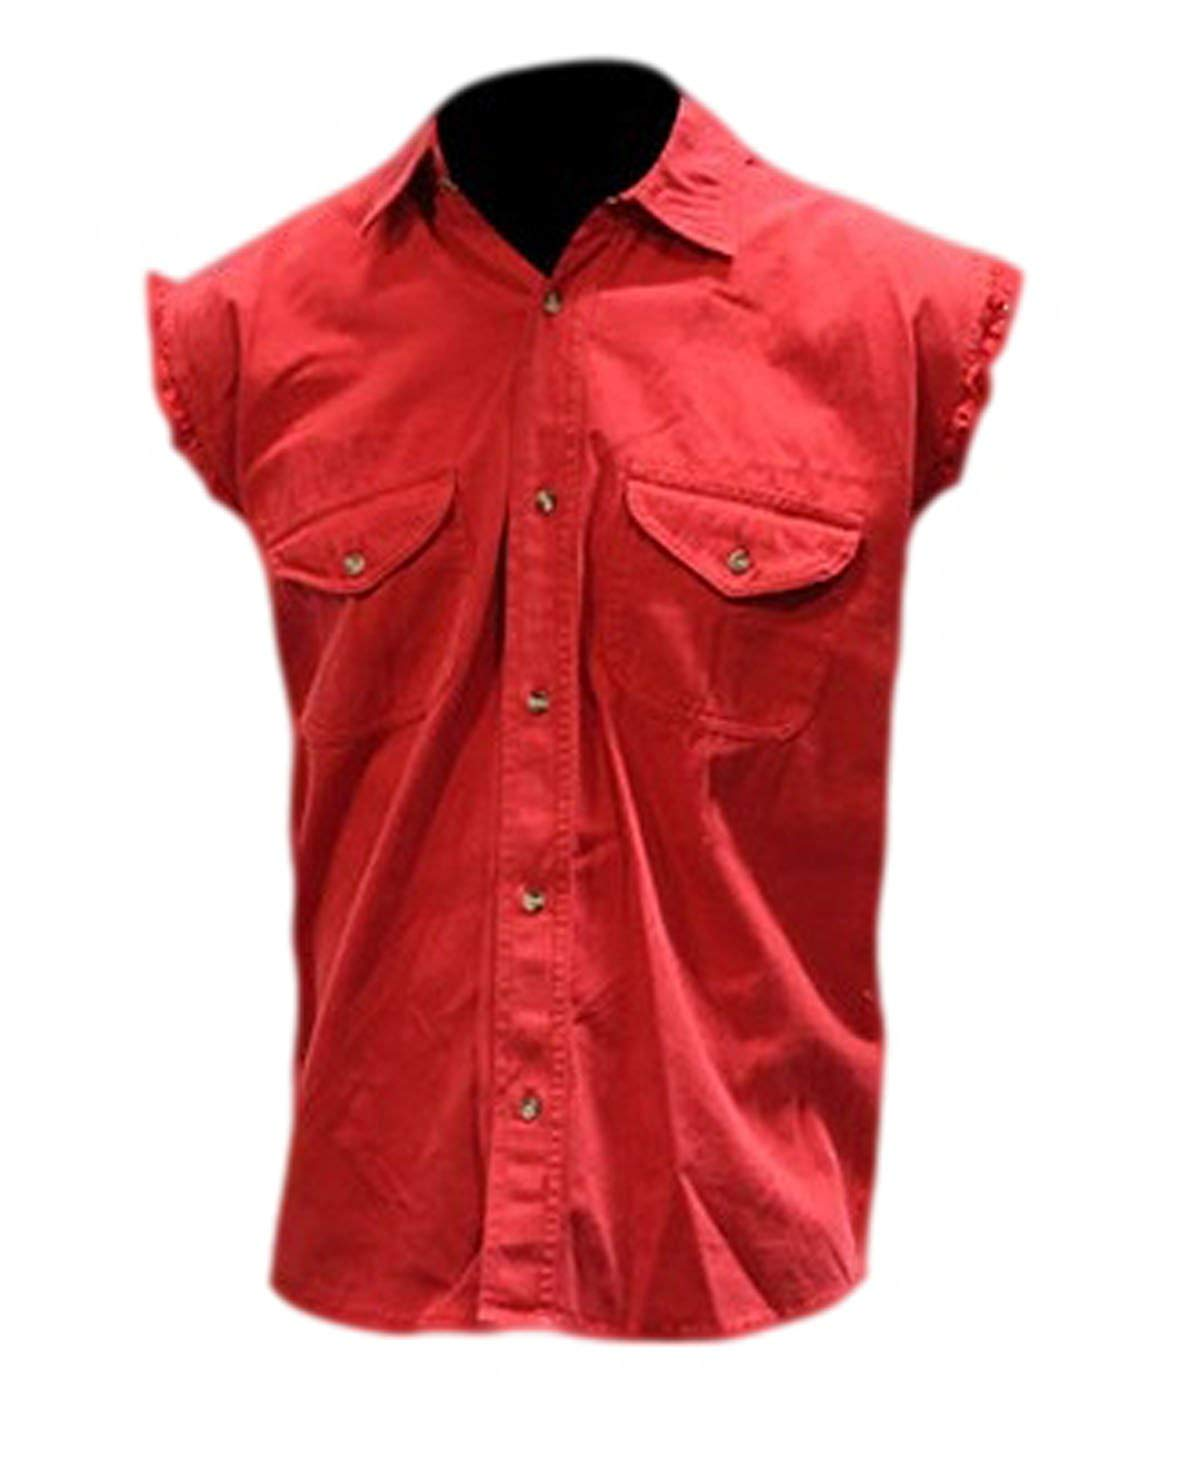 9a526f21f4 Get Quotations · CD D C Mens Cut Off Sleeveless Cotton Denim Button up Biker  Motorcycle Shirts